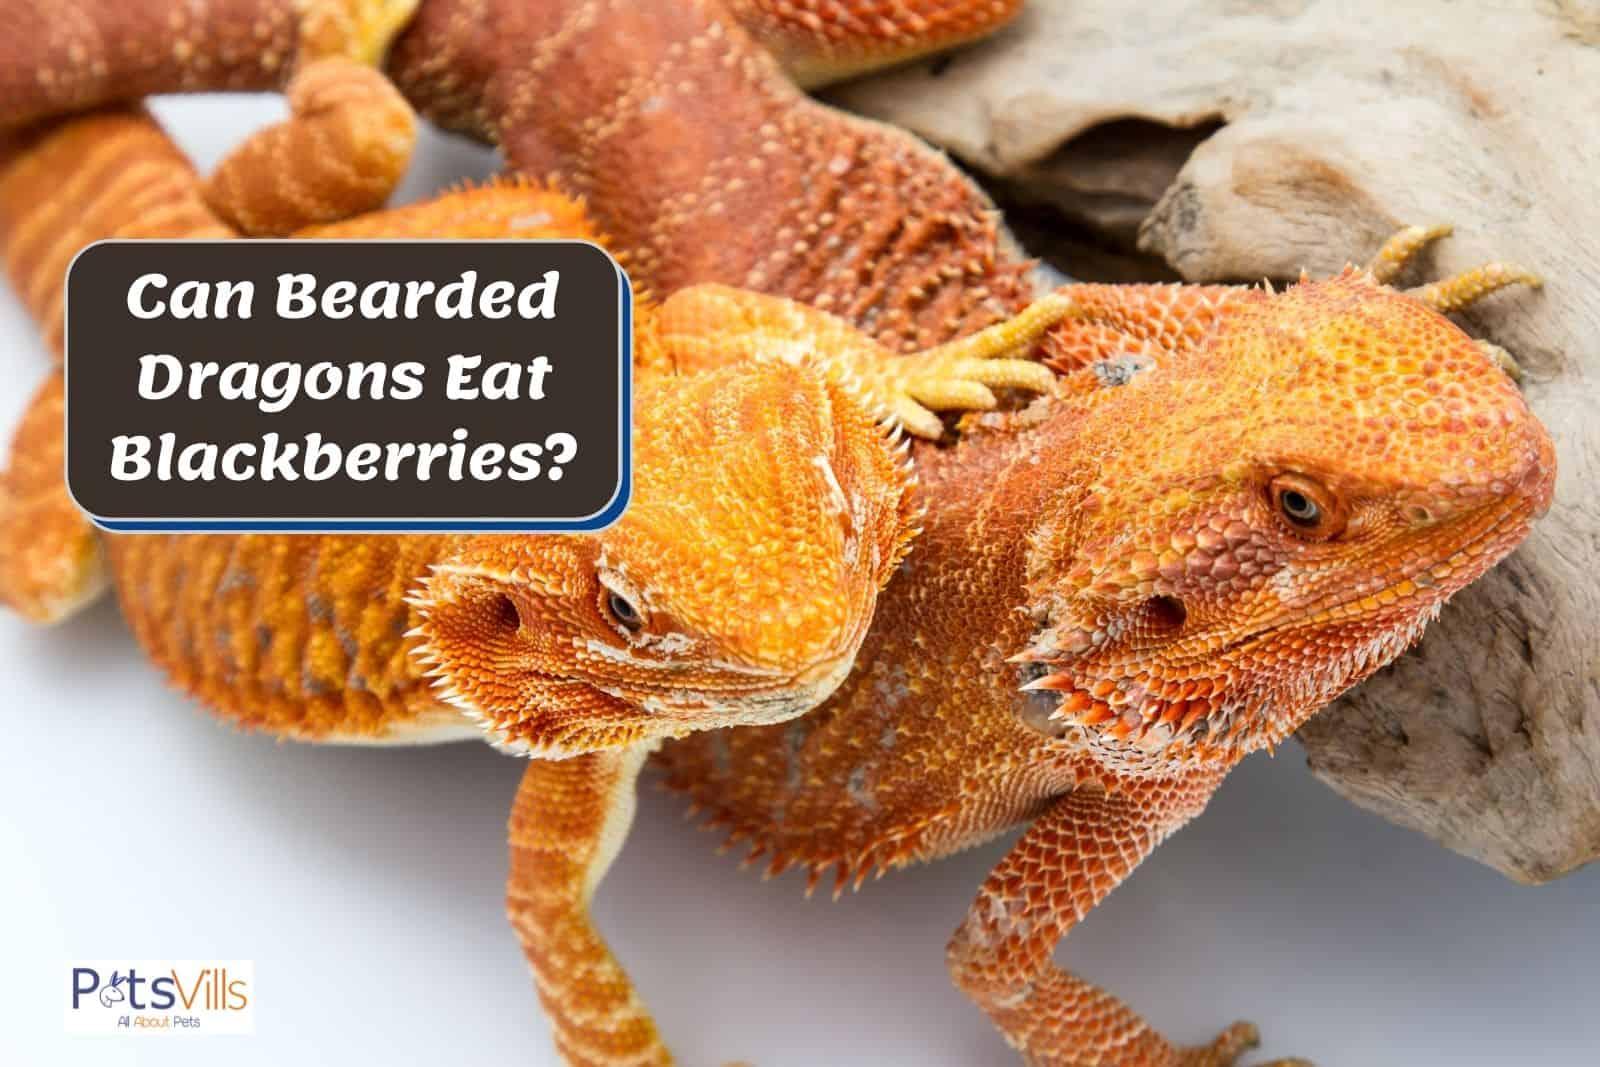 two bright orange bearded dragons